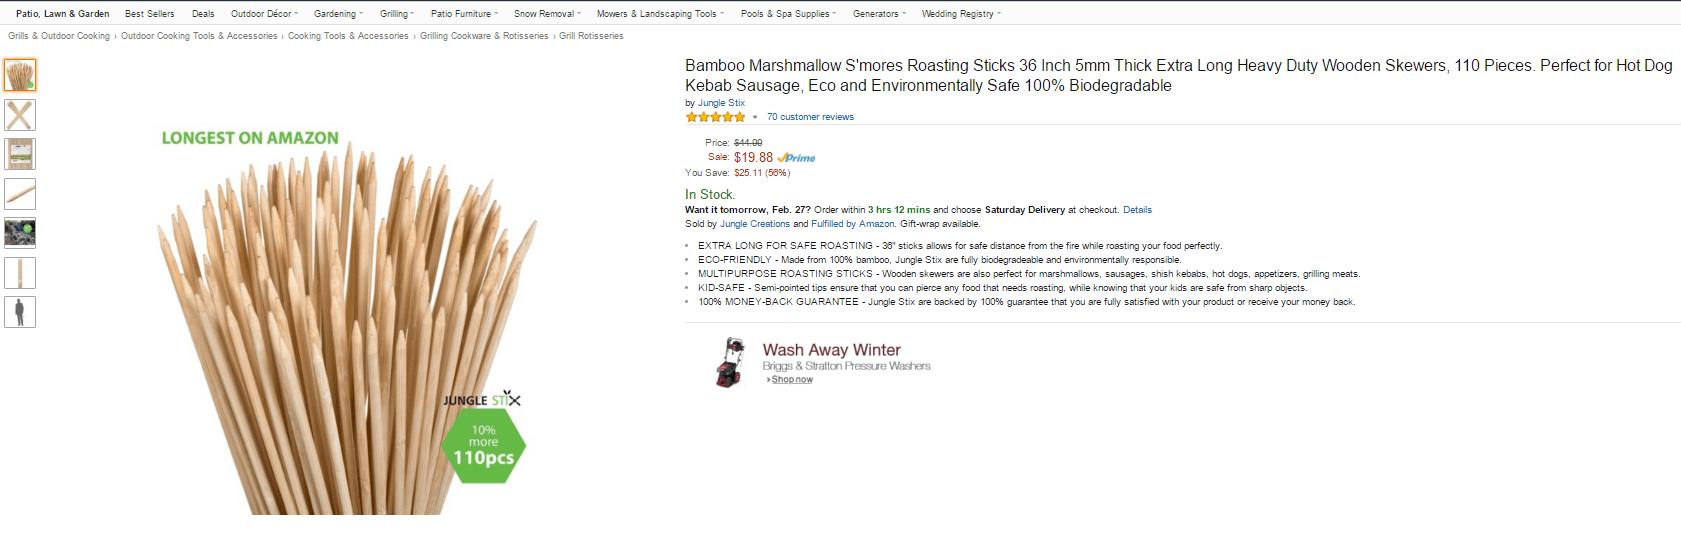 jungle stix listing